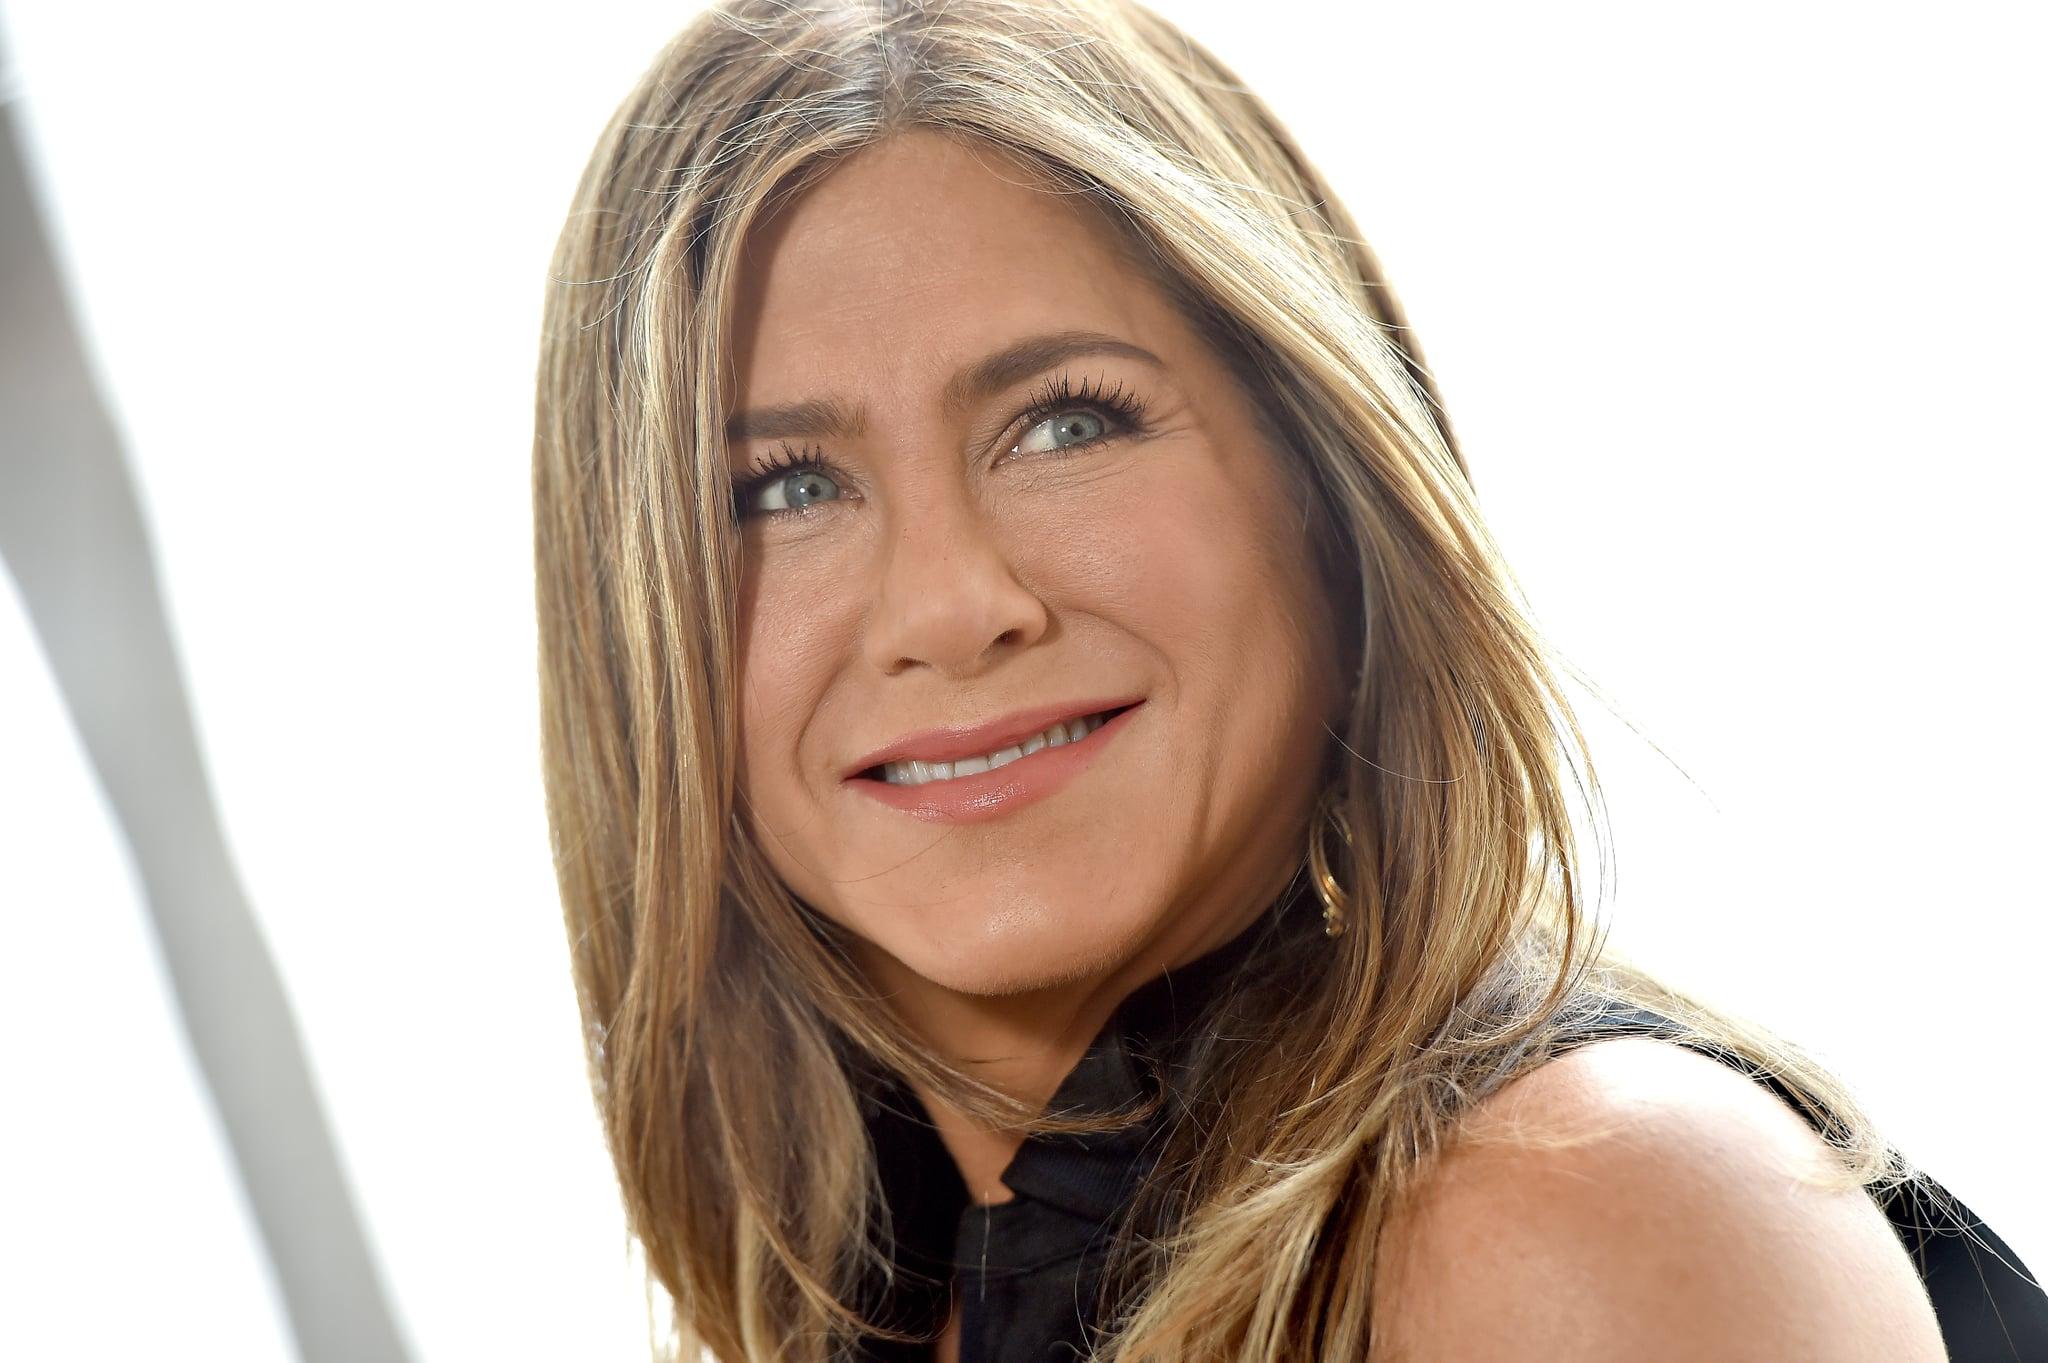 MARINA DEL REY, CALIFORNIA - JUNE 11: Jennifer Aniston attends the photocall of Netflix's